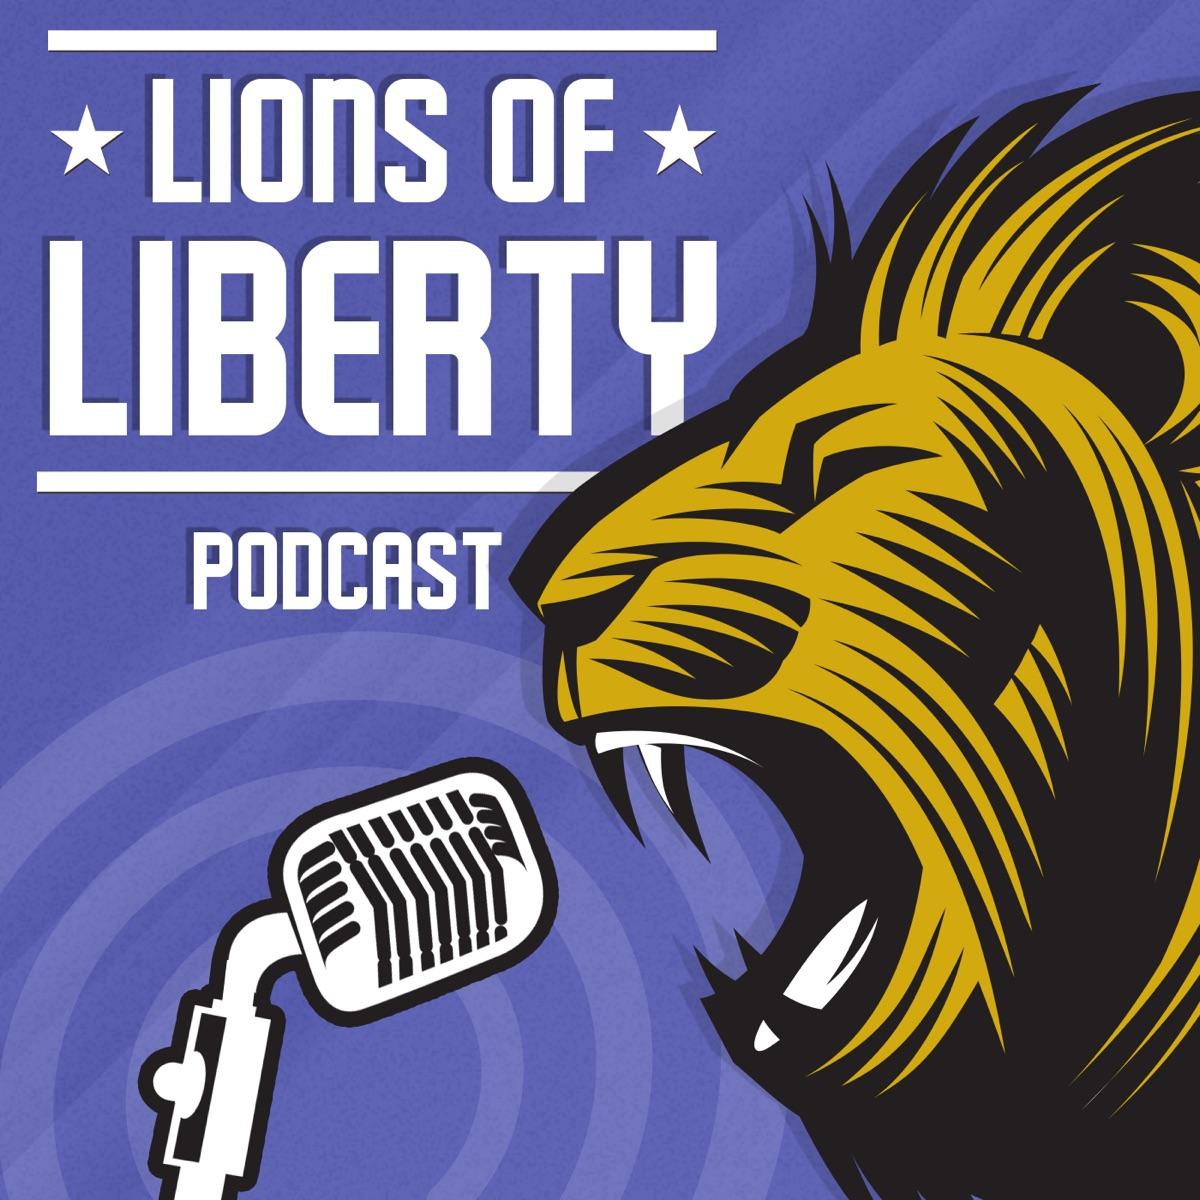 Lions of Liberty